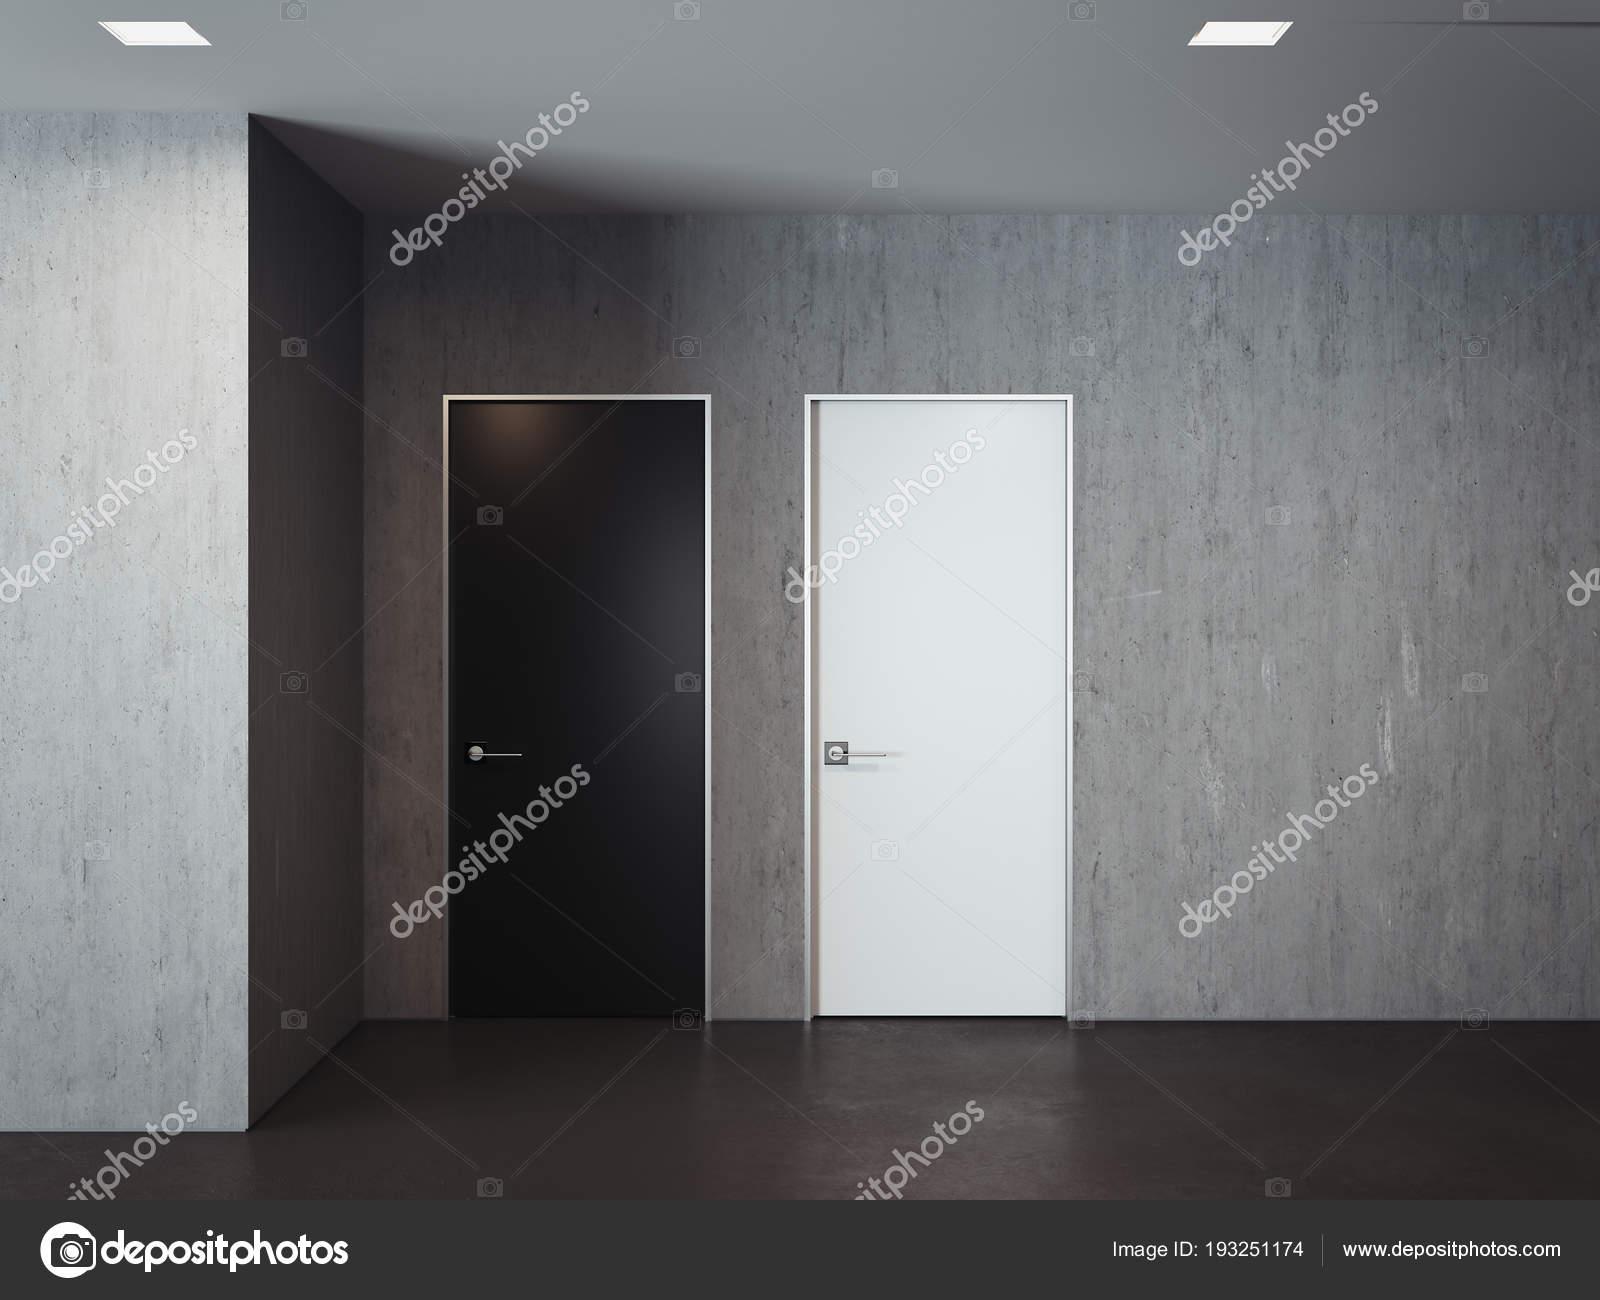 Muri Interni Grigi : Moderna sala luminosa con porte di muri grigi bianco e nero